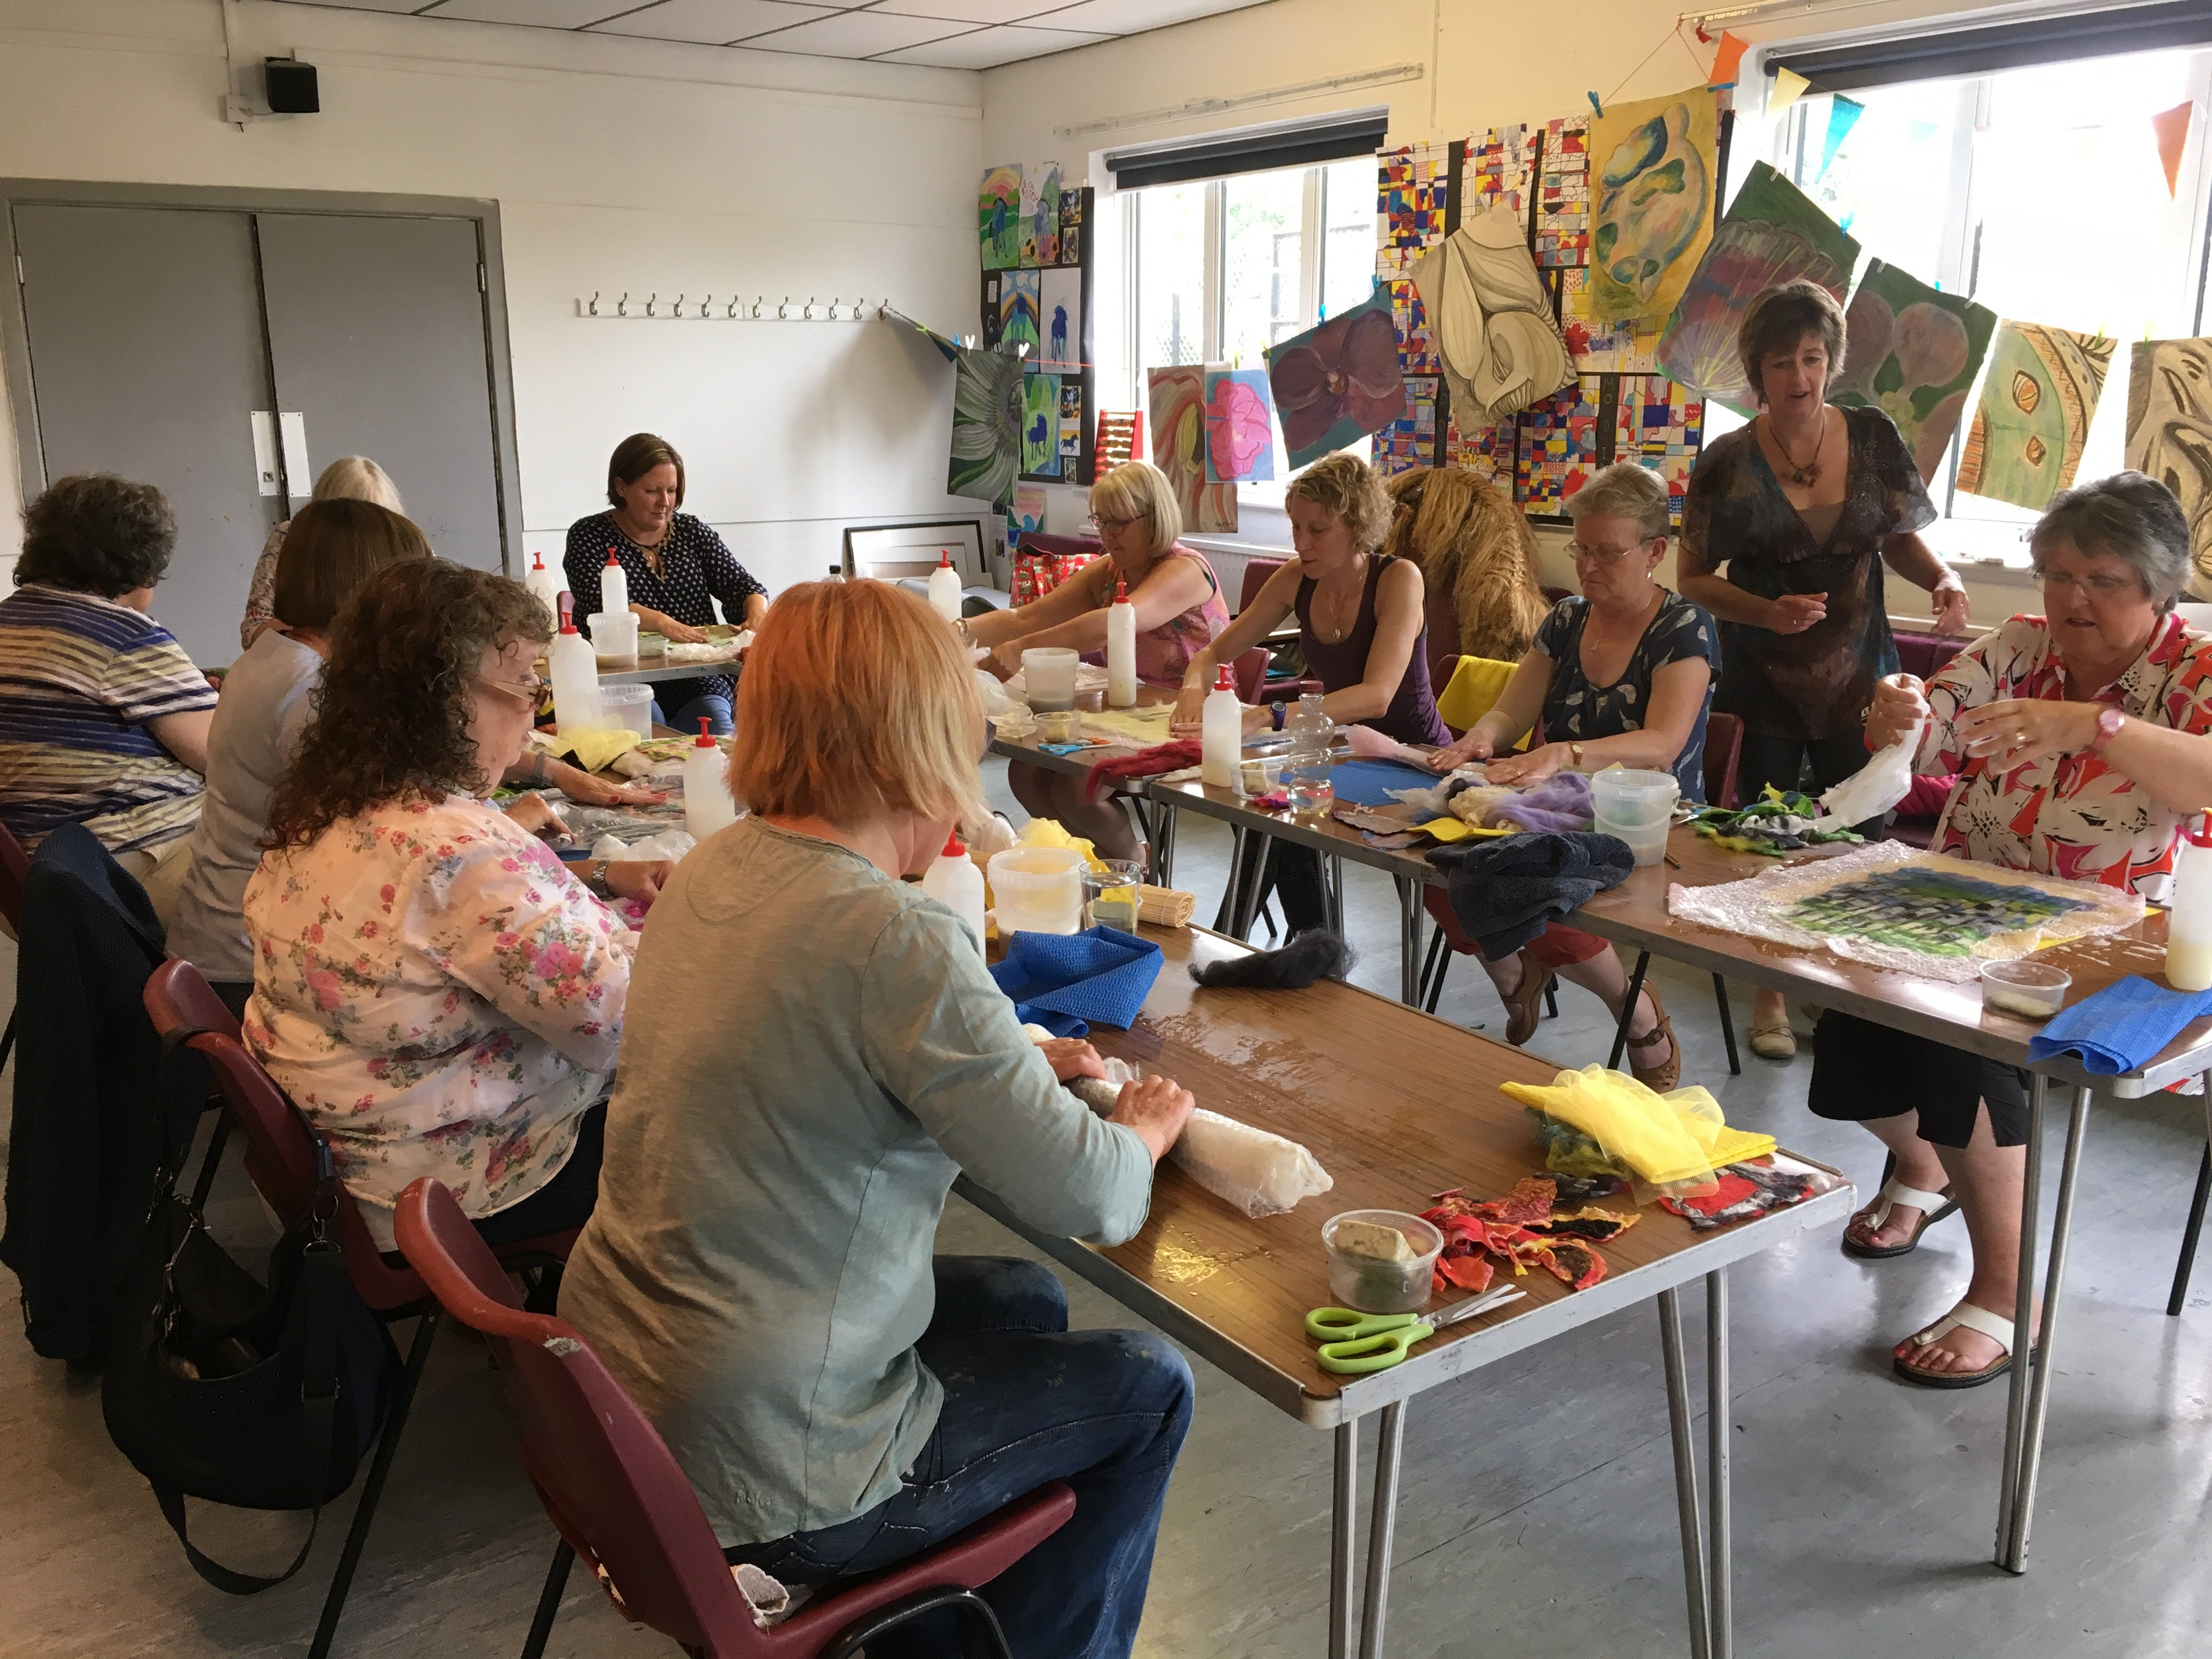 Felt Workshop at Forest Arts Centre during the 2017 Arts Festival